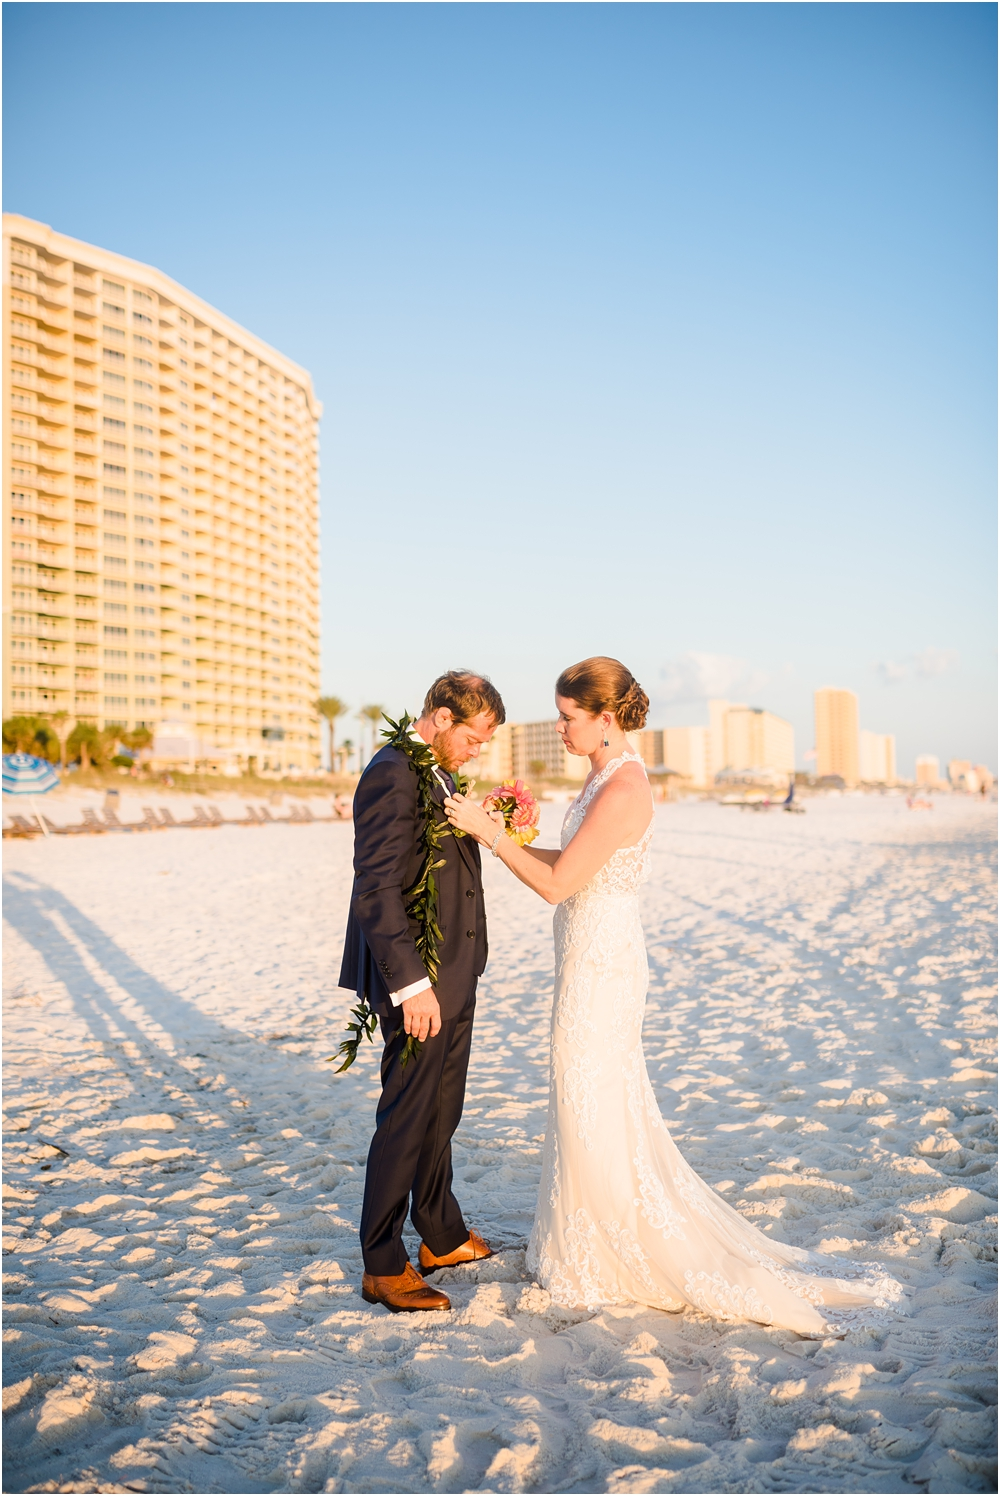 ledman-wedding-kiersten-stevenson-photography-30a-panama-city-beach-dothan-tallahassee-(438-of-763).JPG